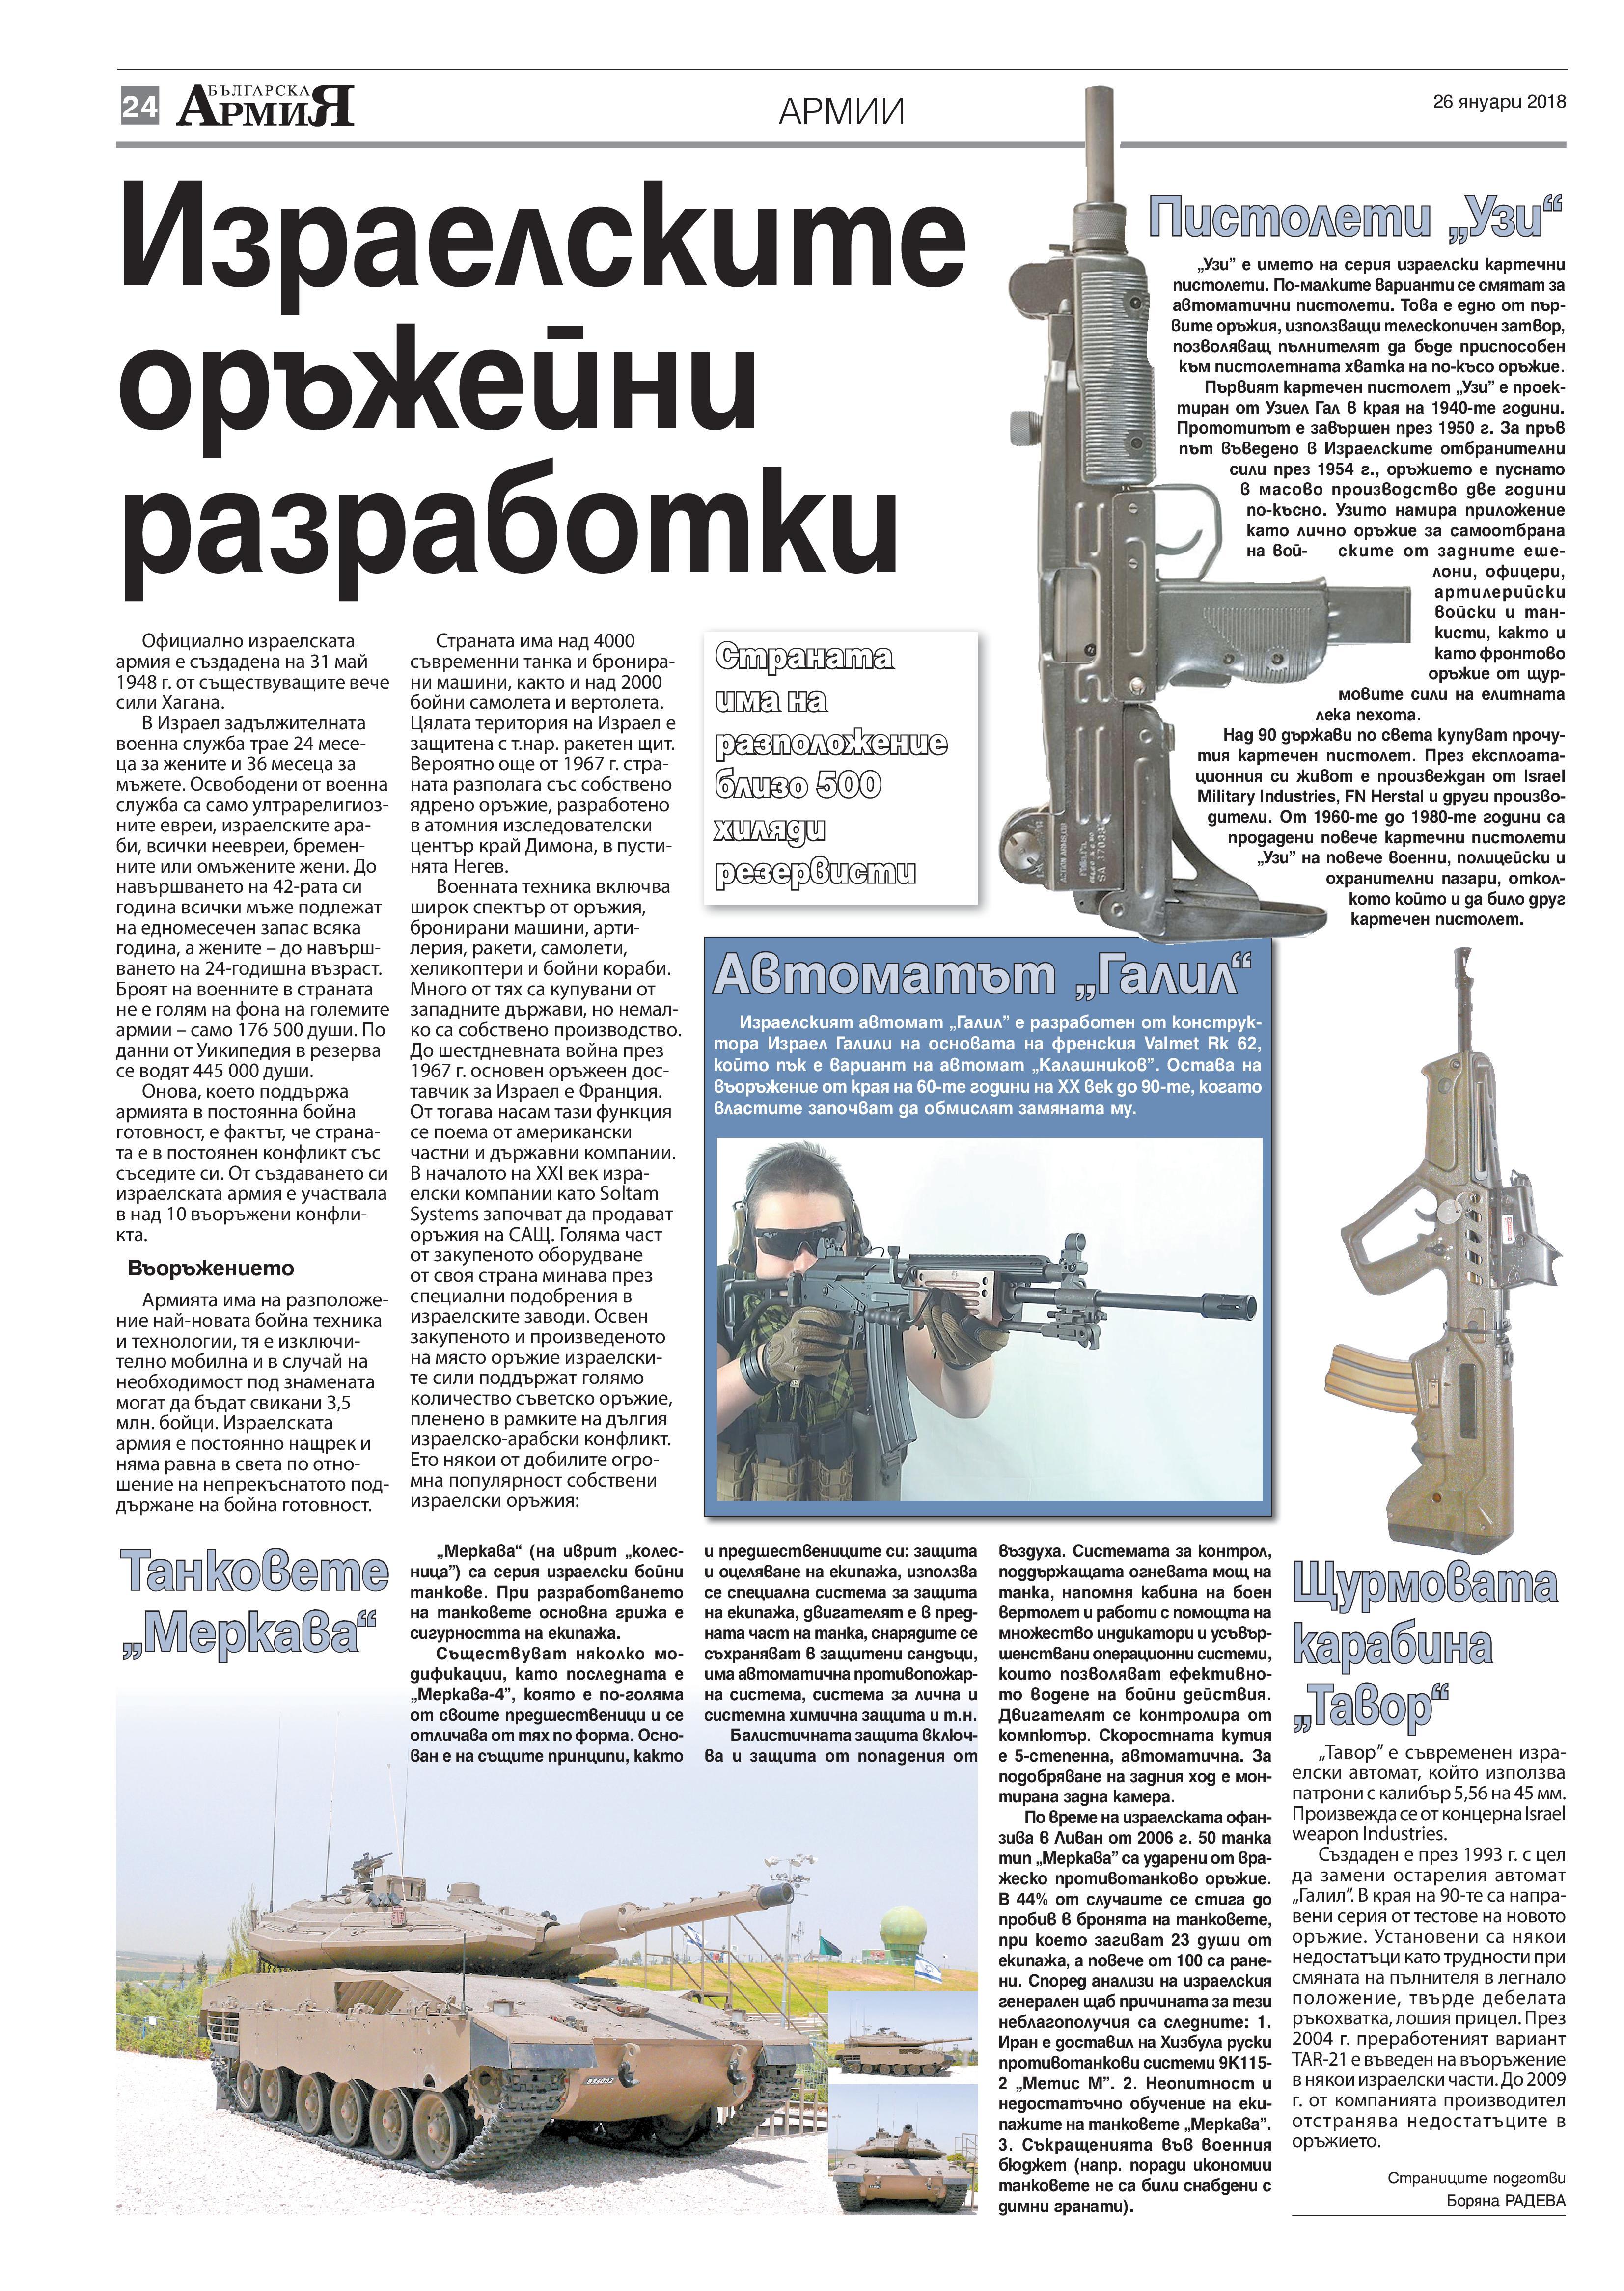 https://armymedia.bg/wp-content/uploads/2015/06/24-18.jpg